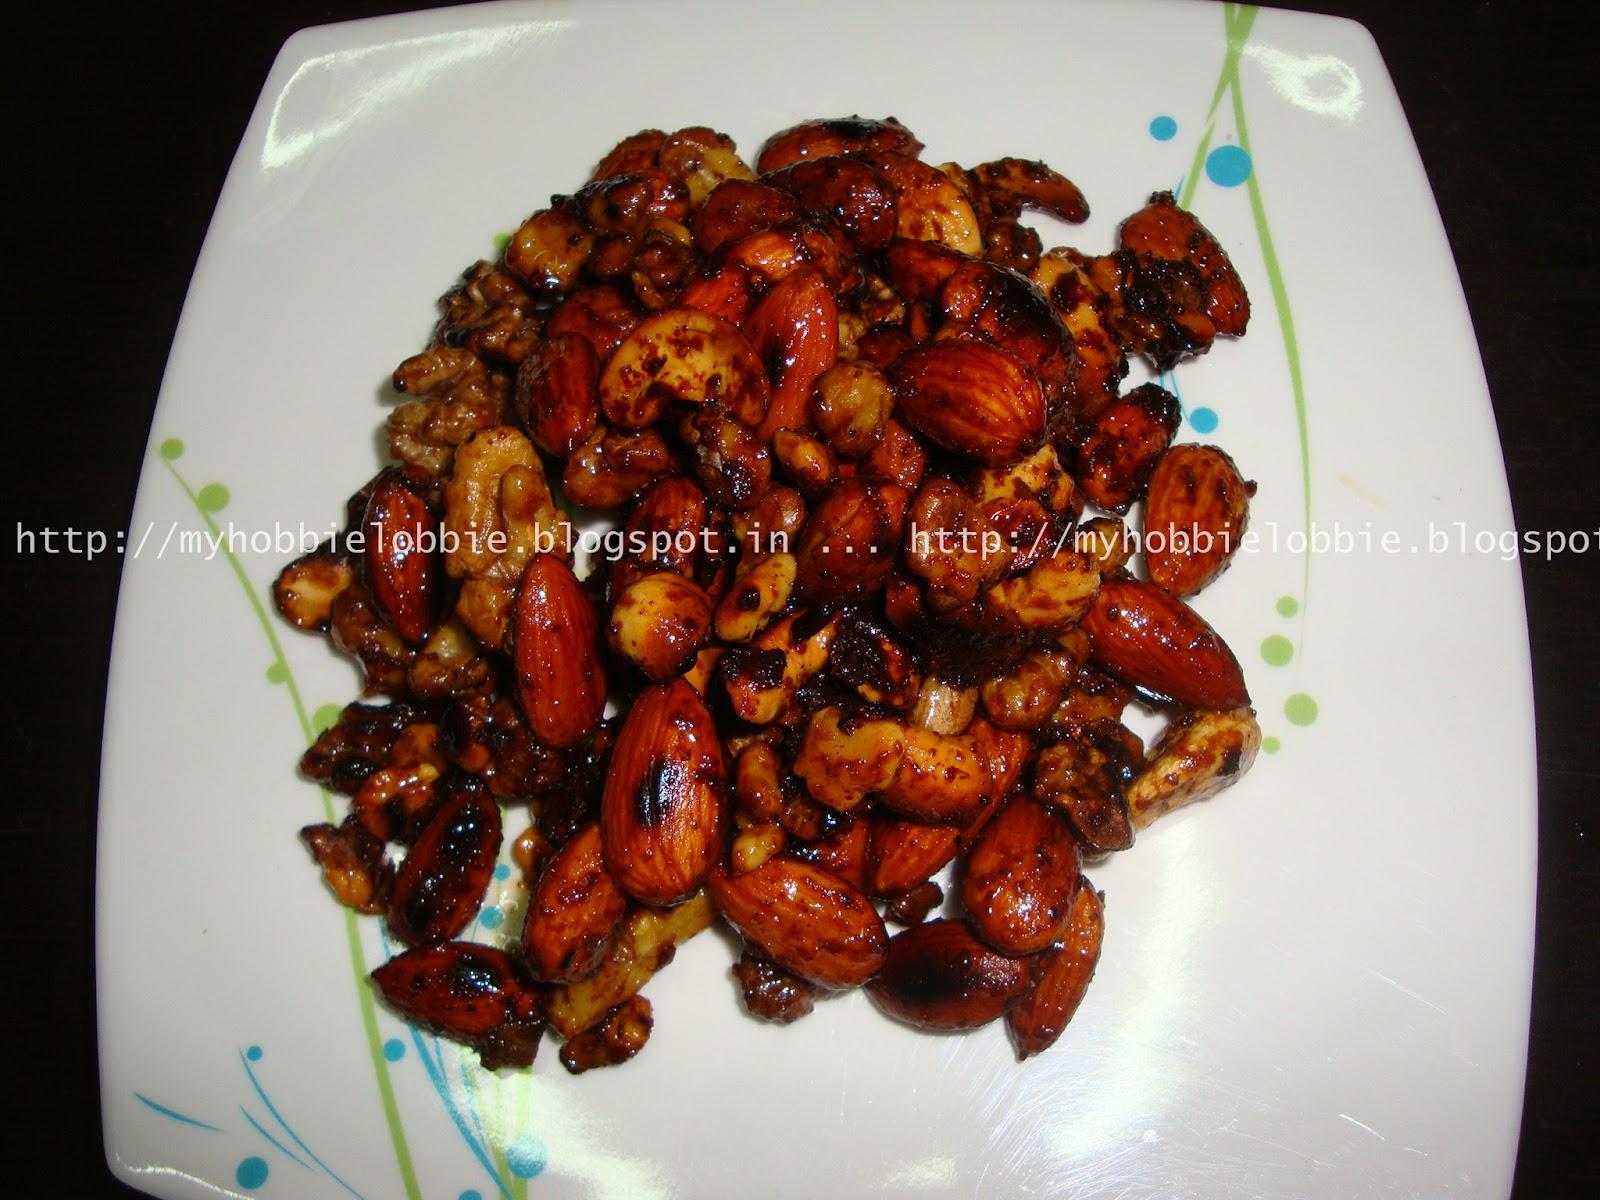 ... Lobbie: Week 1 of 12 Weeks of Christmas Treats: Candied Spiced Nuts